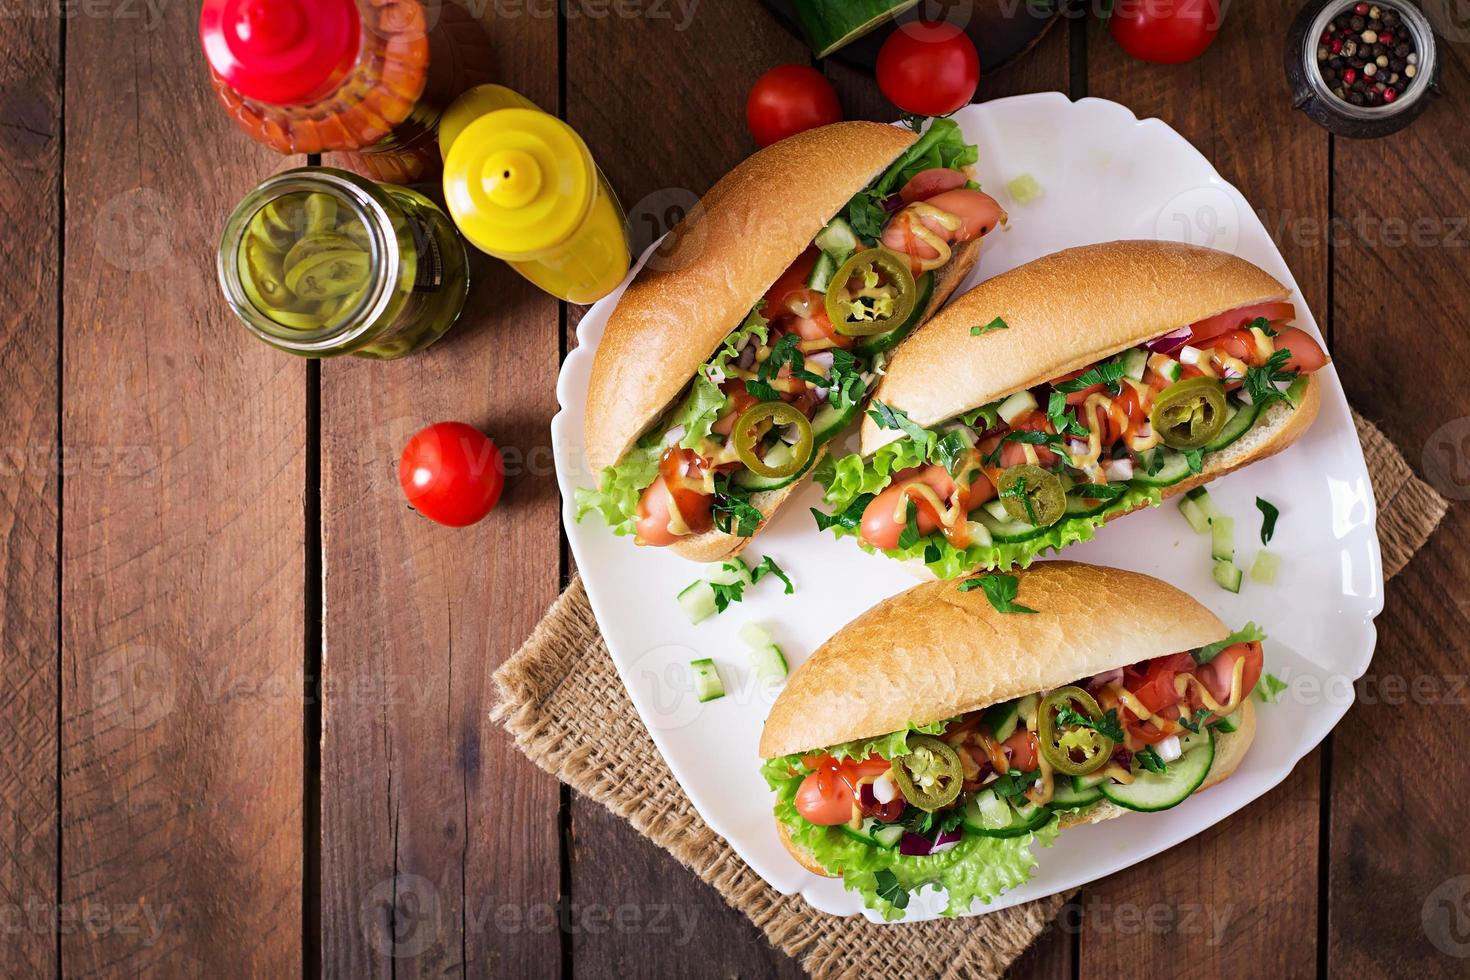 hotdog met jalapeno pepers, tomaat, komkommer en sla foto